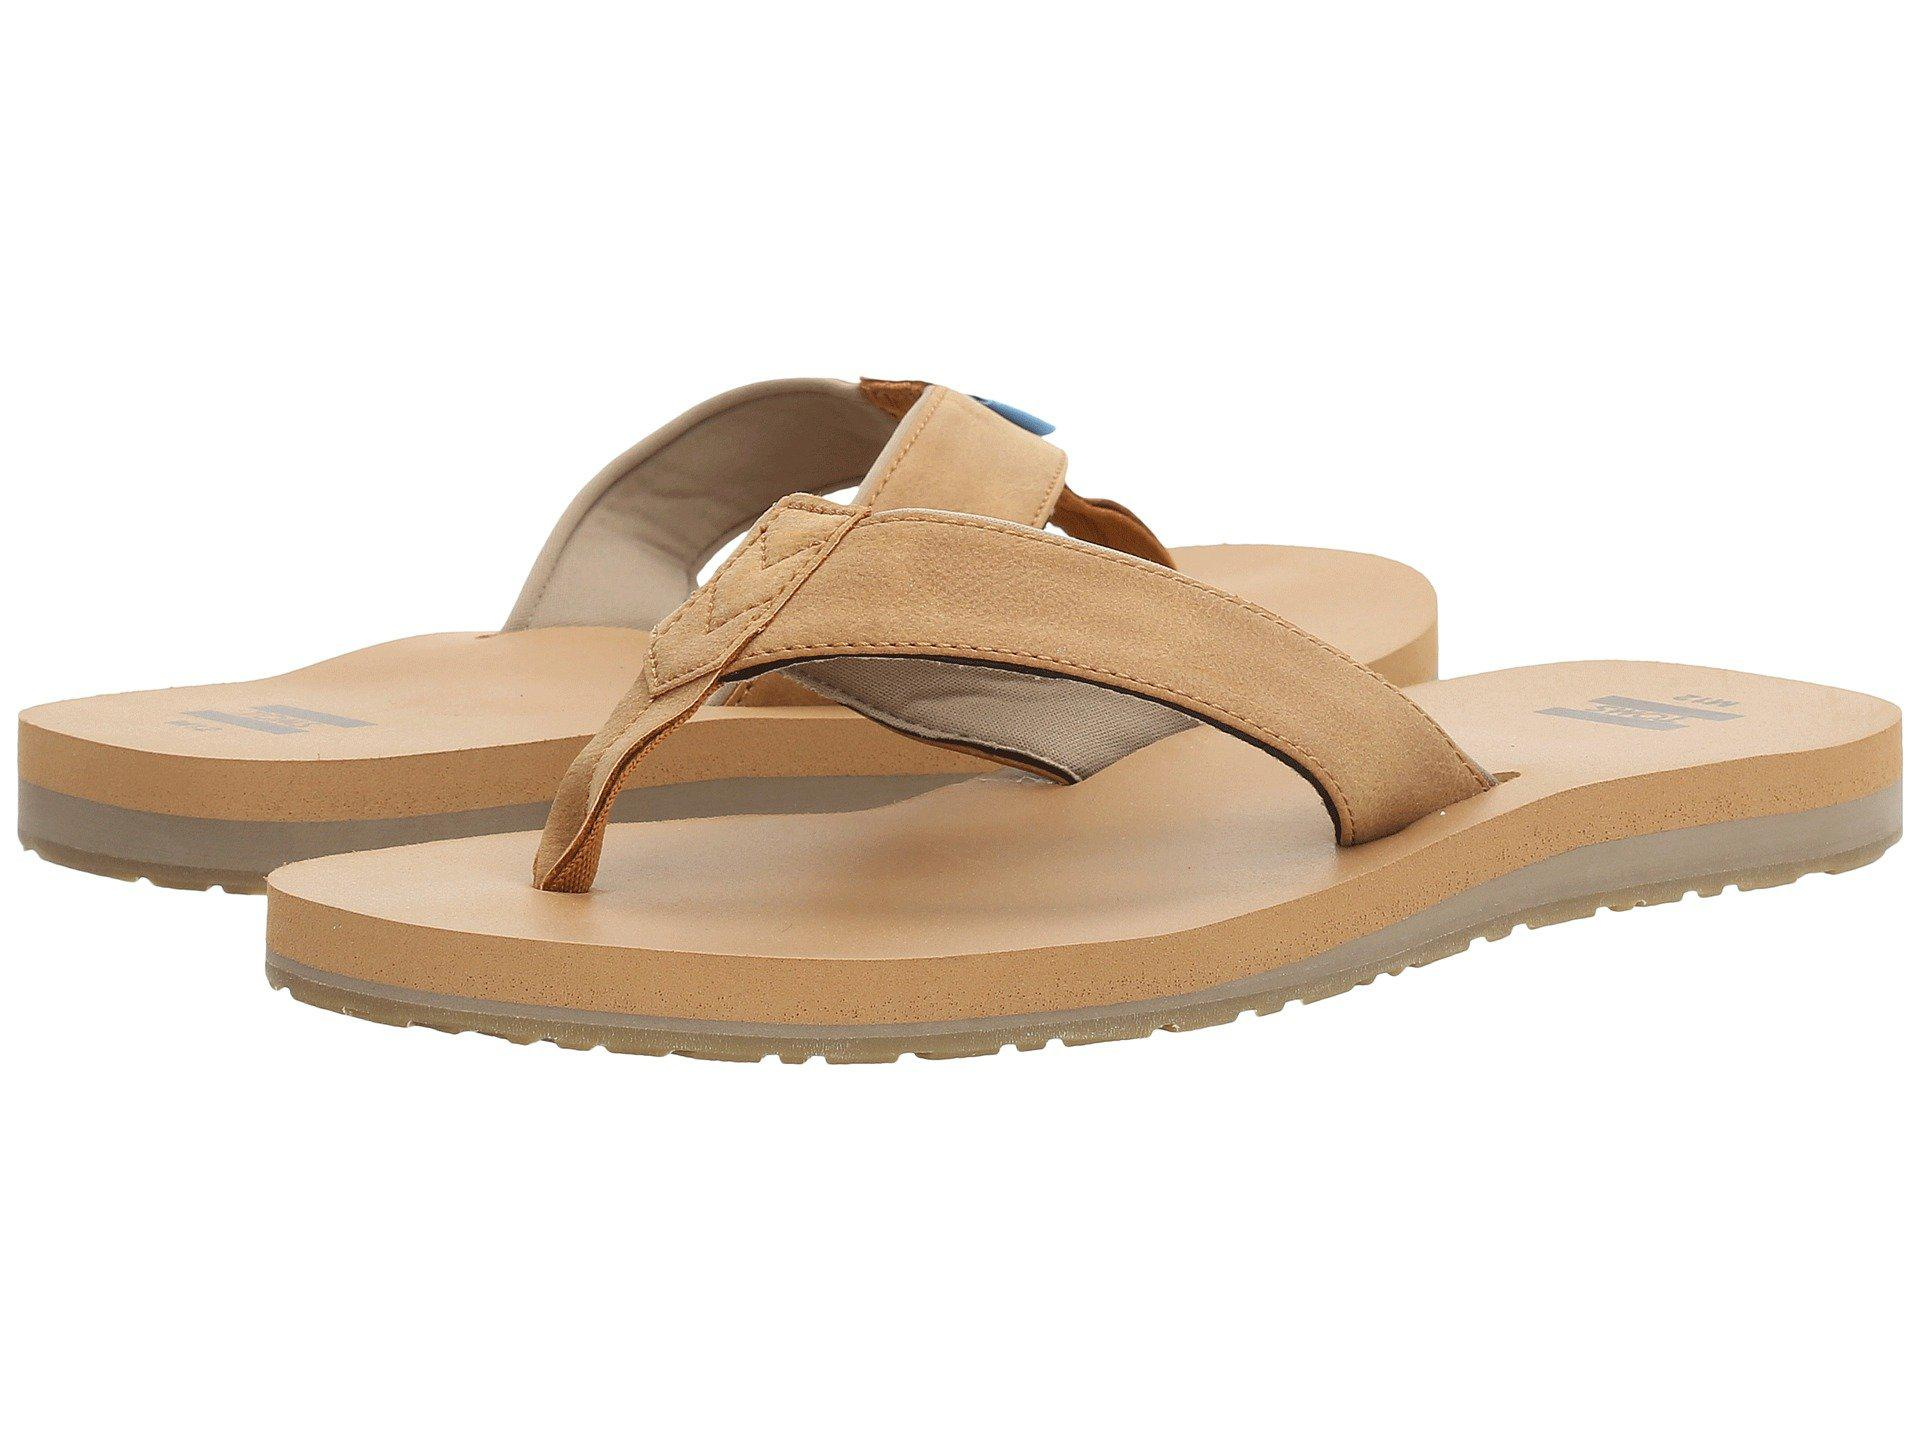 0a3f88774616 TOMS - Carilo Flip Flop (toffee Brown) Men s Sandals for Men - Lyst. View  fullscreen